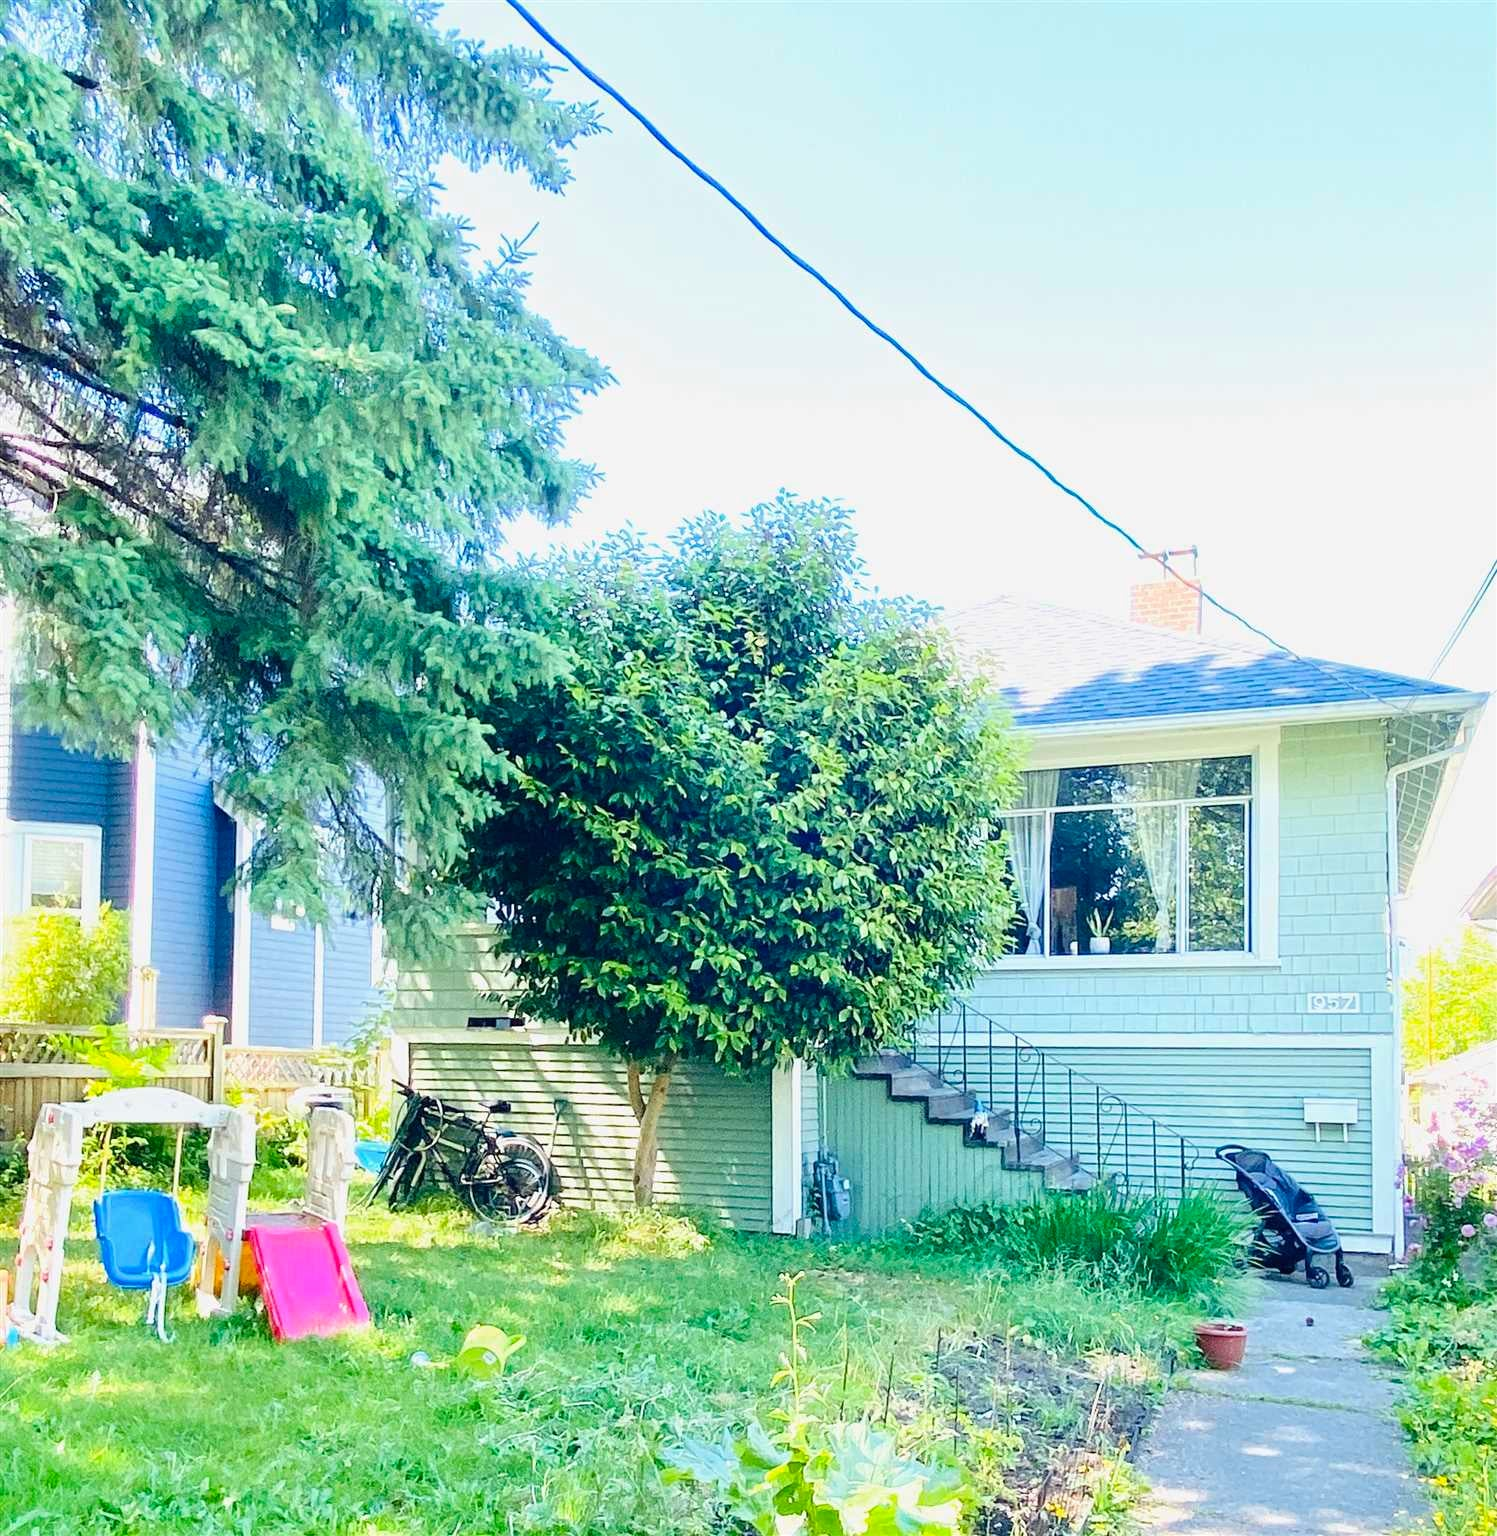 957 E 15TH AVENUE - Mount Pleasant VE House/Single Family for sale, 4 Bedrooms (R2591504) - #1